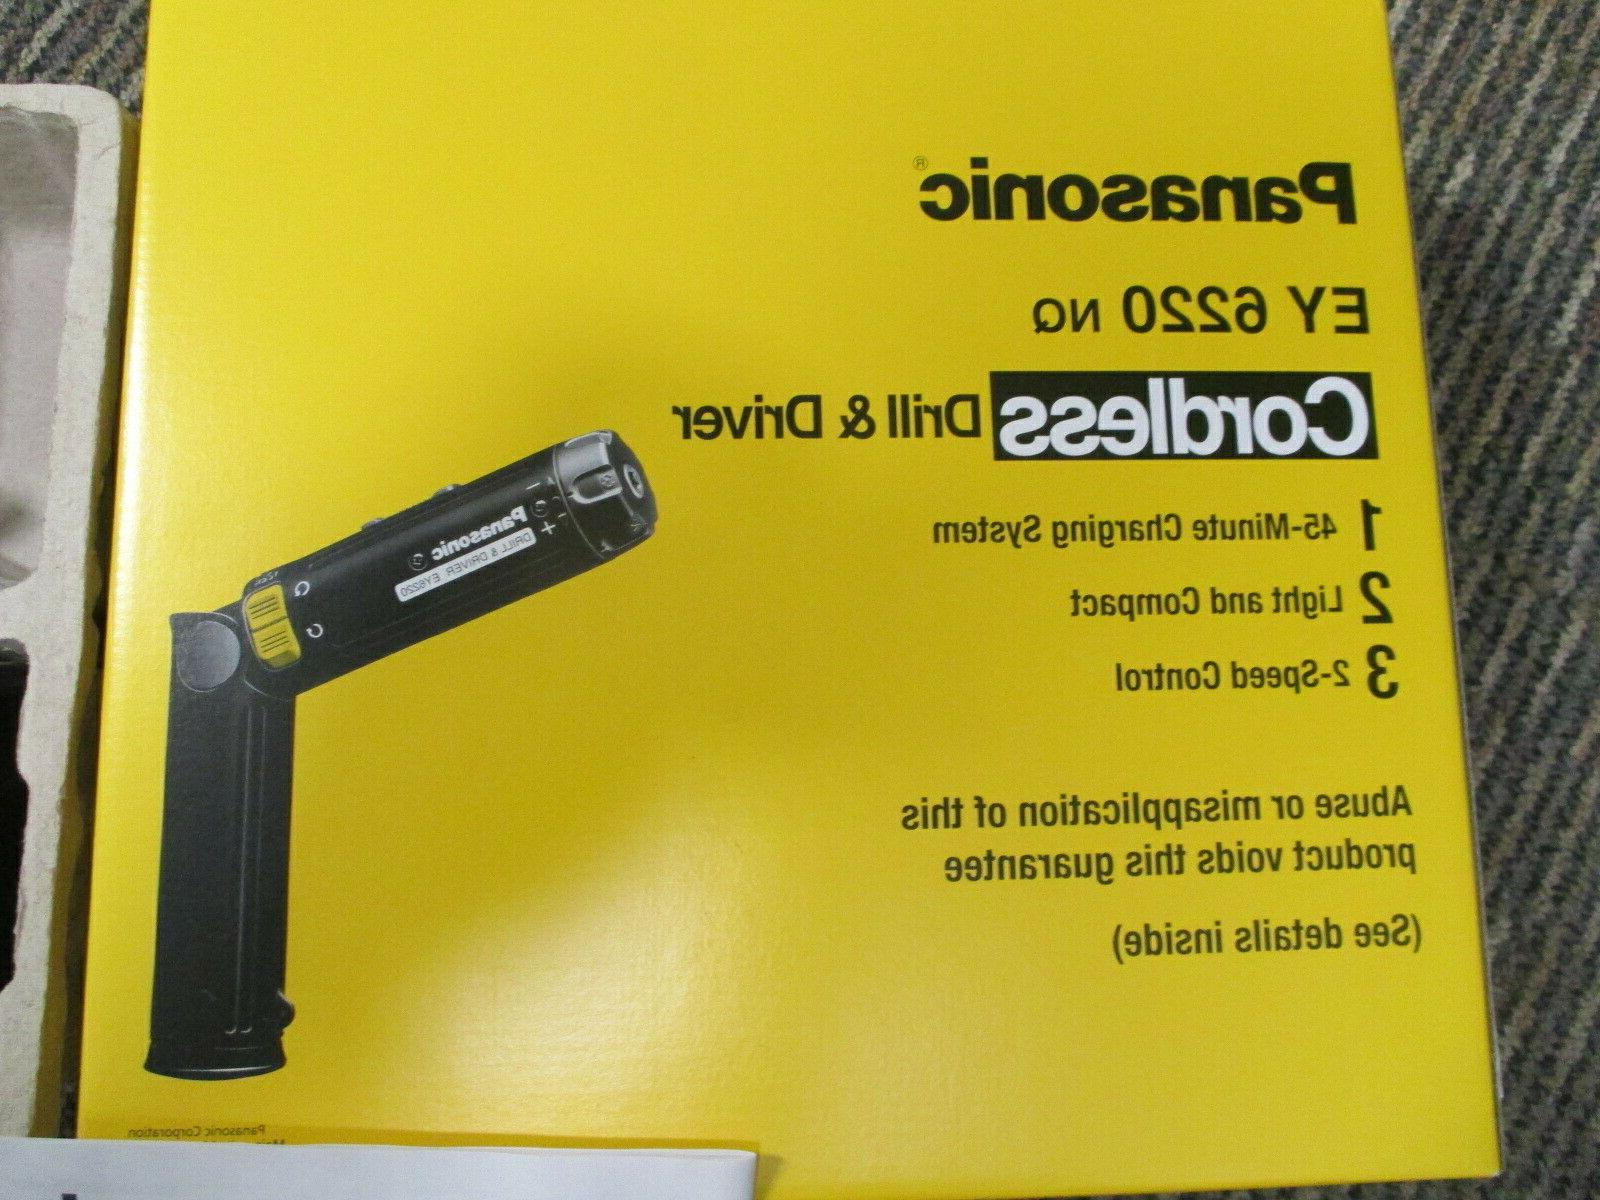 PANASONIC Drill/Driver 1.2A/hr NEW